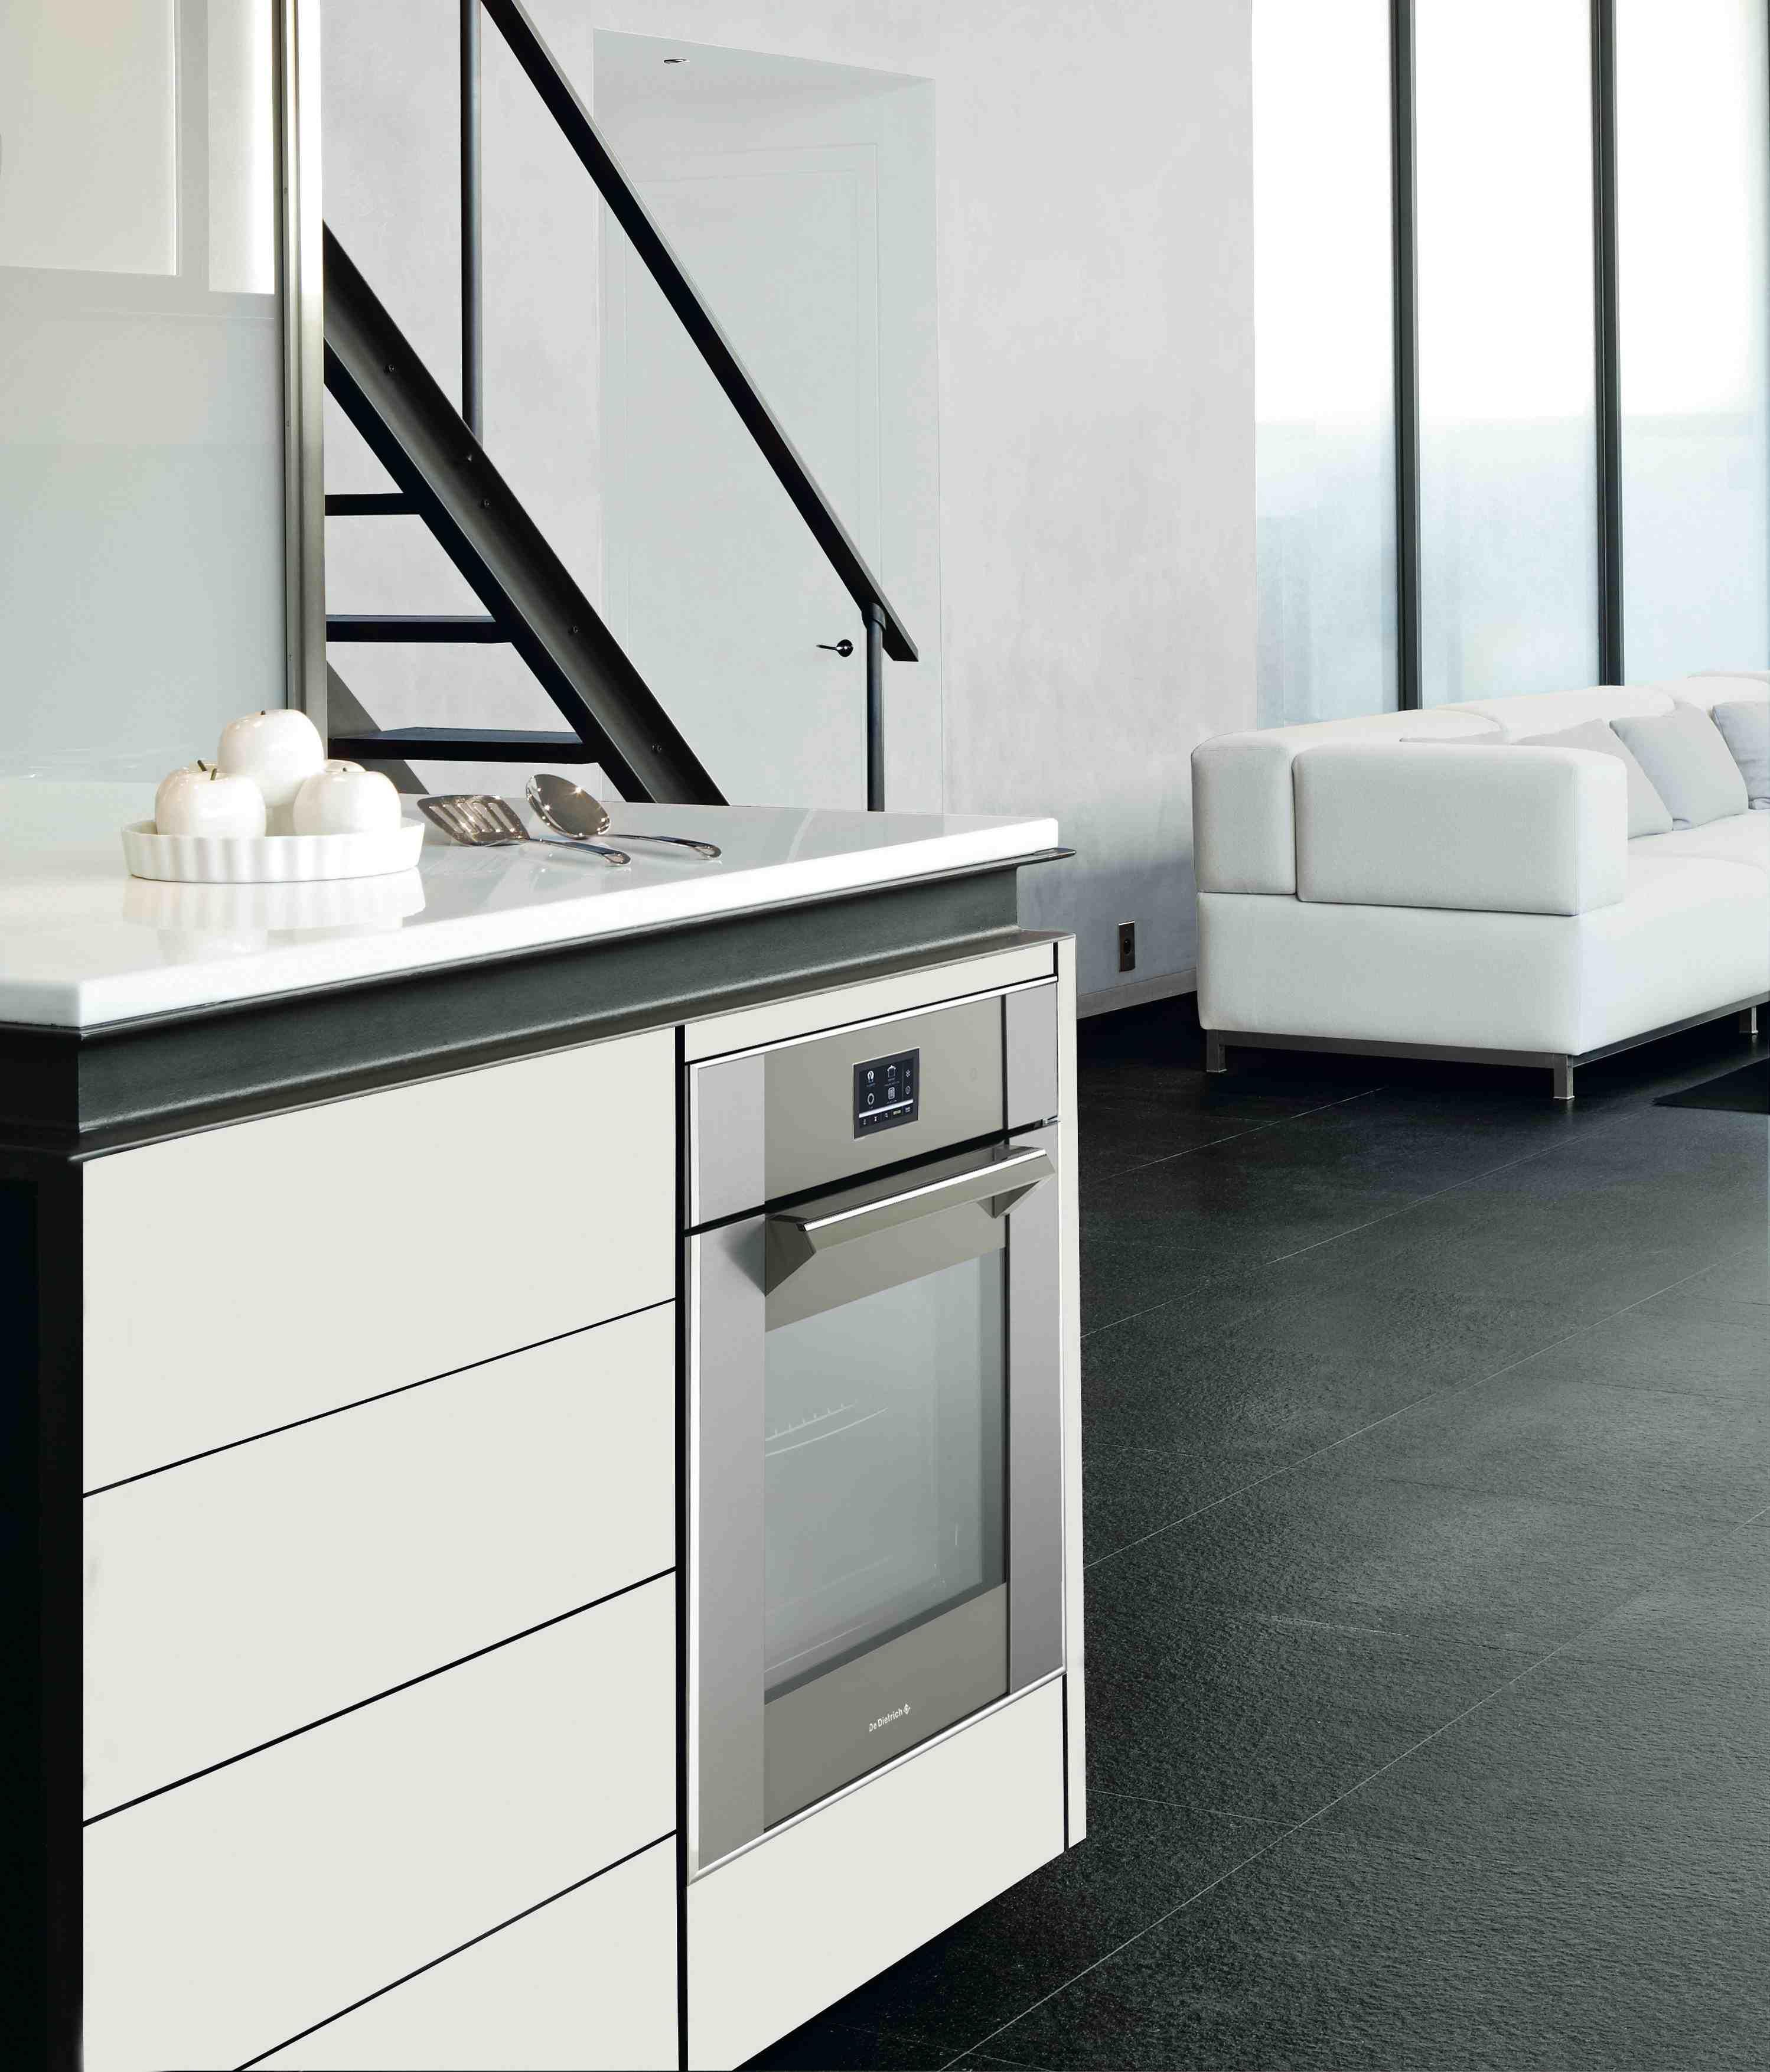 De Dietrich Kitchen Appliances Sneak Peek De Dietrich 2014 Range The Kitchen And Bathroom Blog